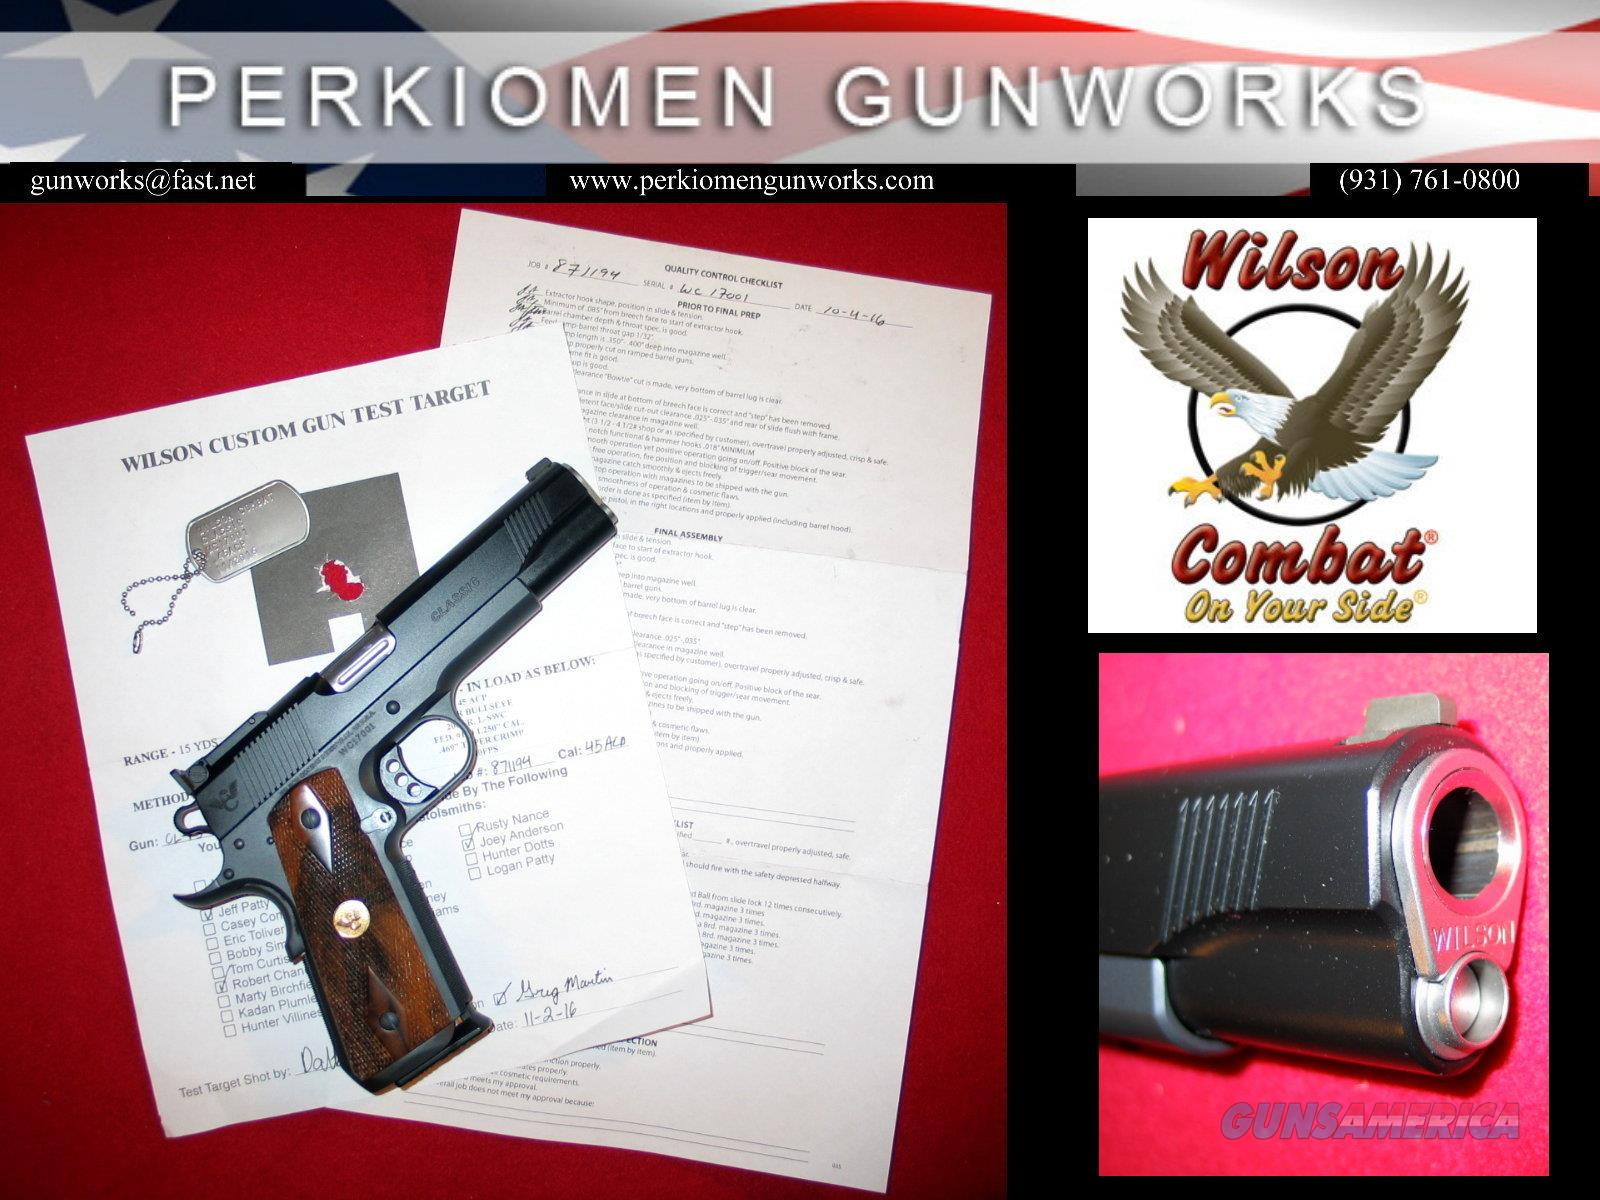 Classic .45acp, full size 1911, Gray/Black, French Walnut plus many additional custom extras, NIB  Guns > Pistols > Wilson Combat Pistols